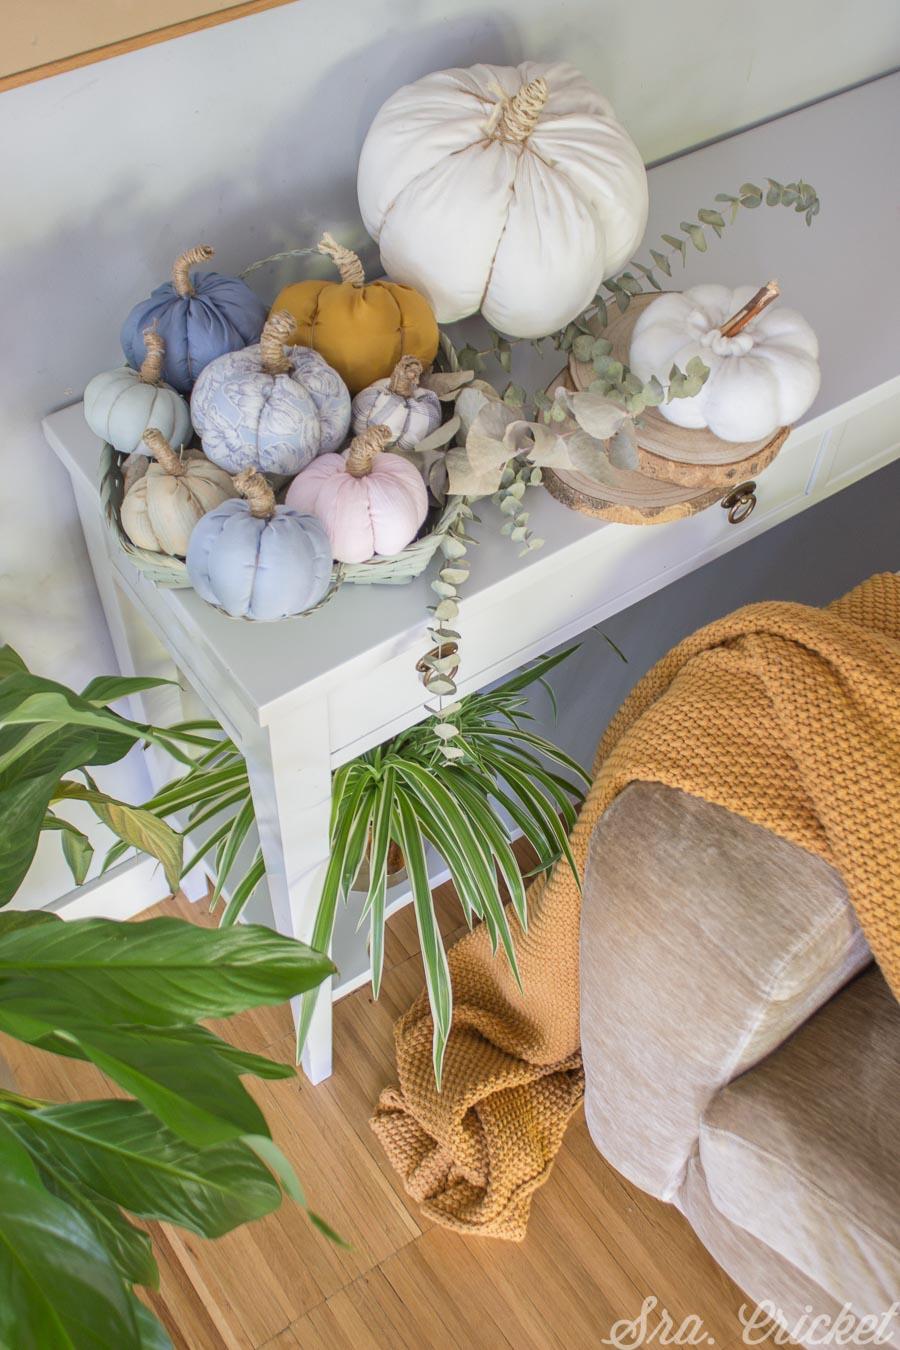 decorar con calabazas de tela hechas a mano